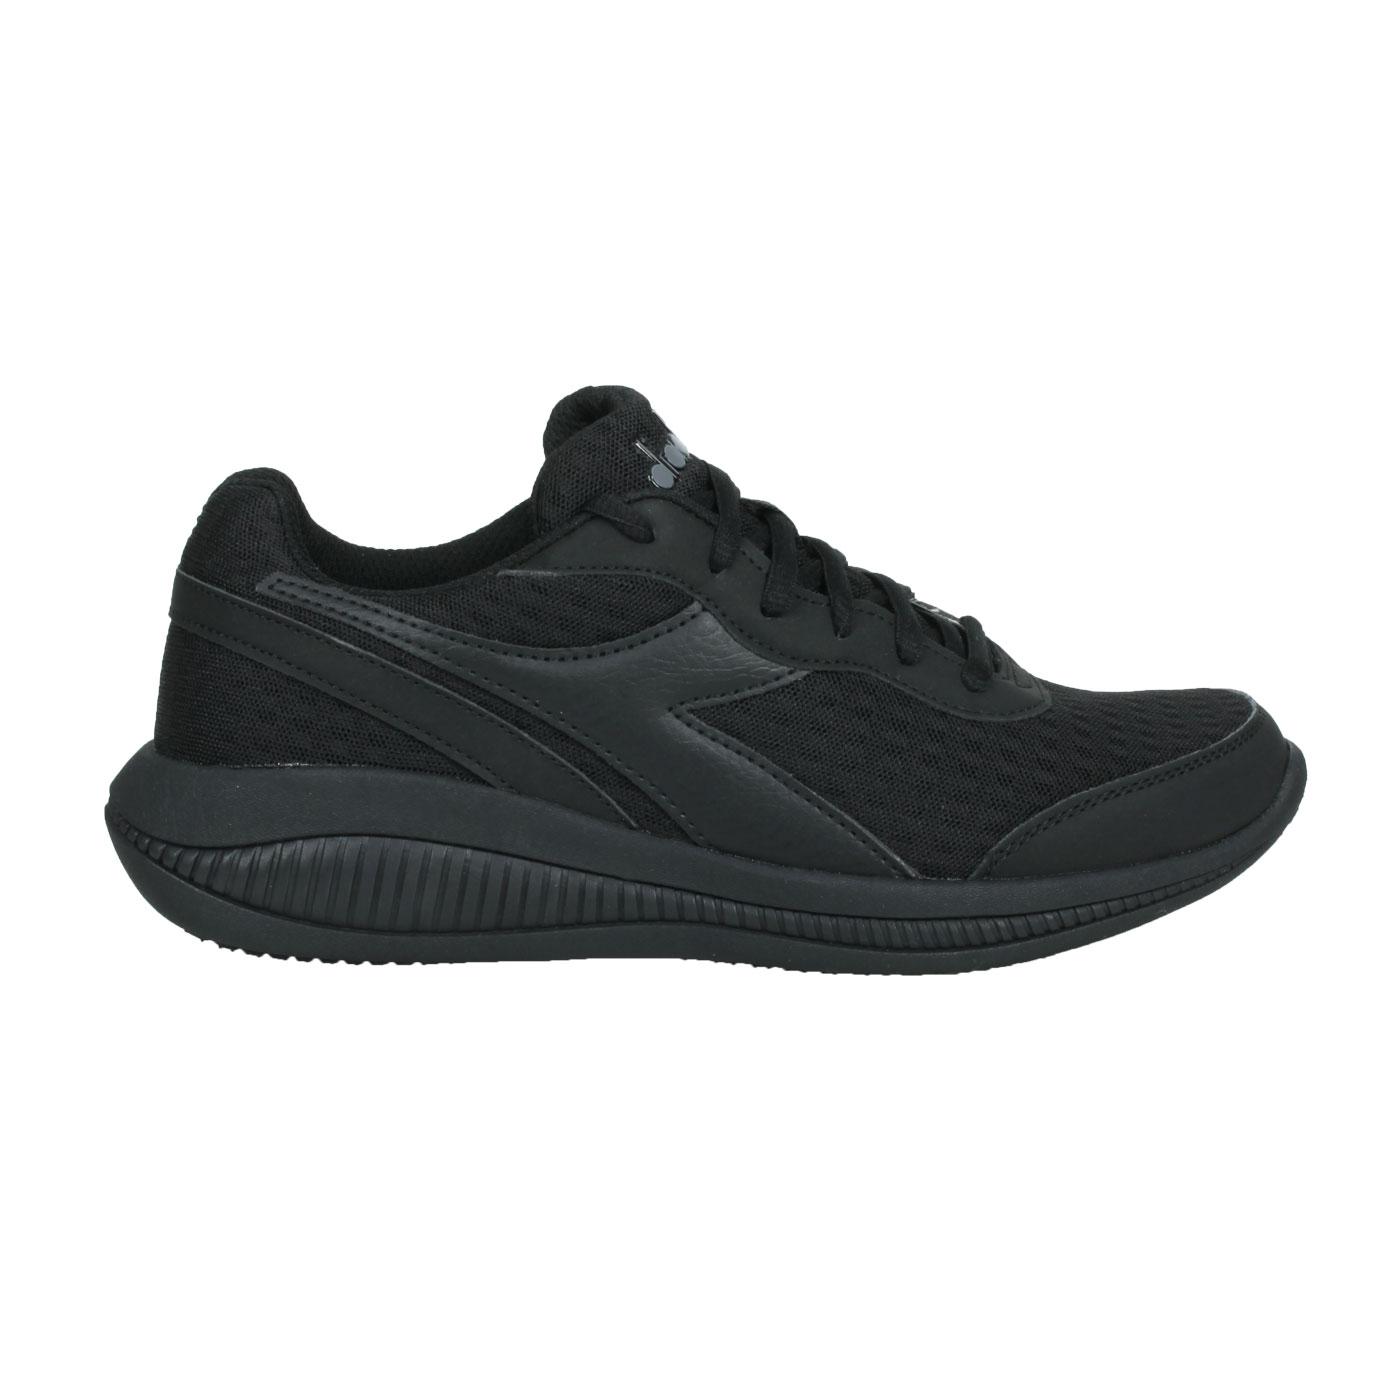 DIADORA 女款進口慢跑鞋 DA176894-C0200